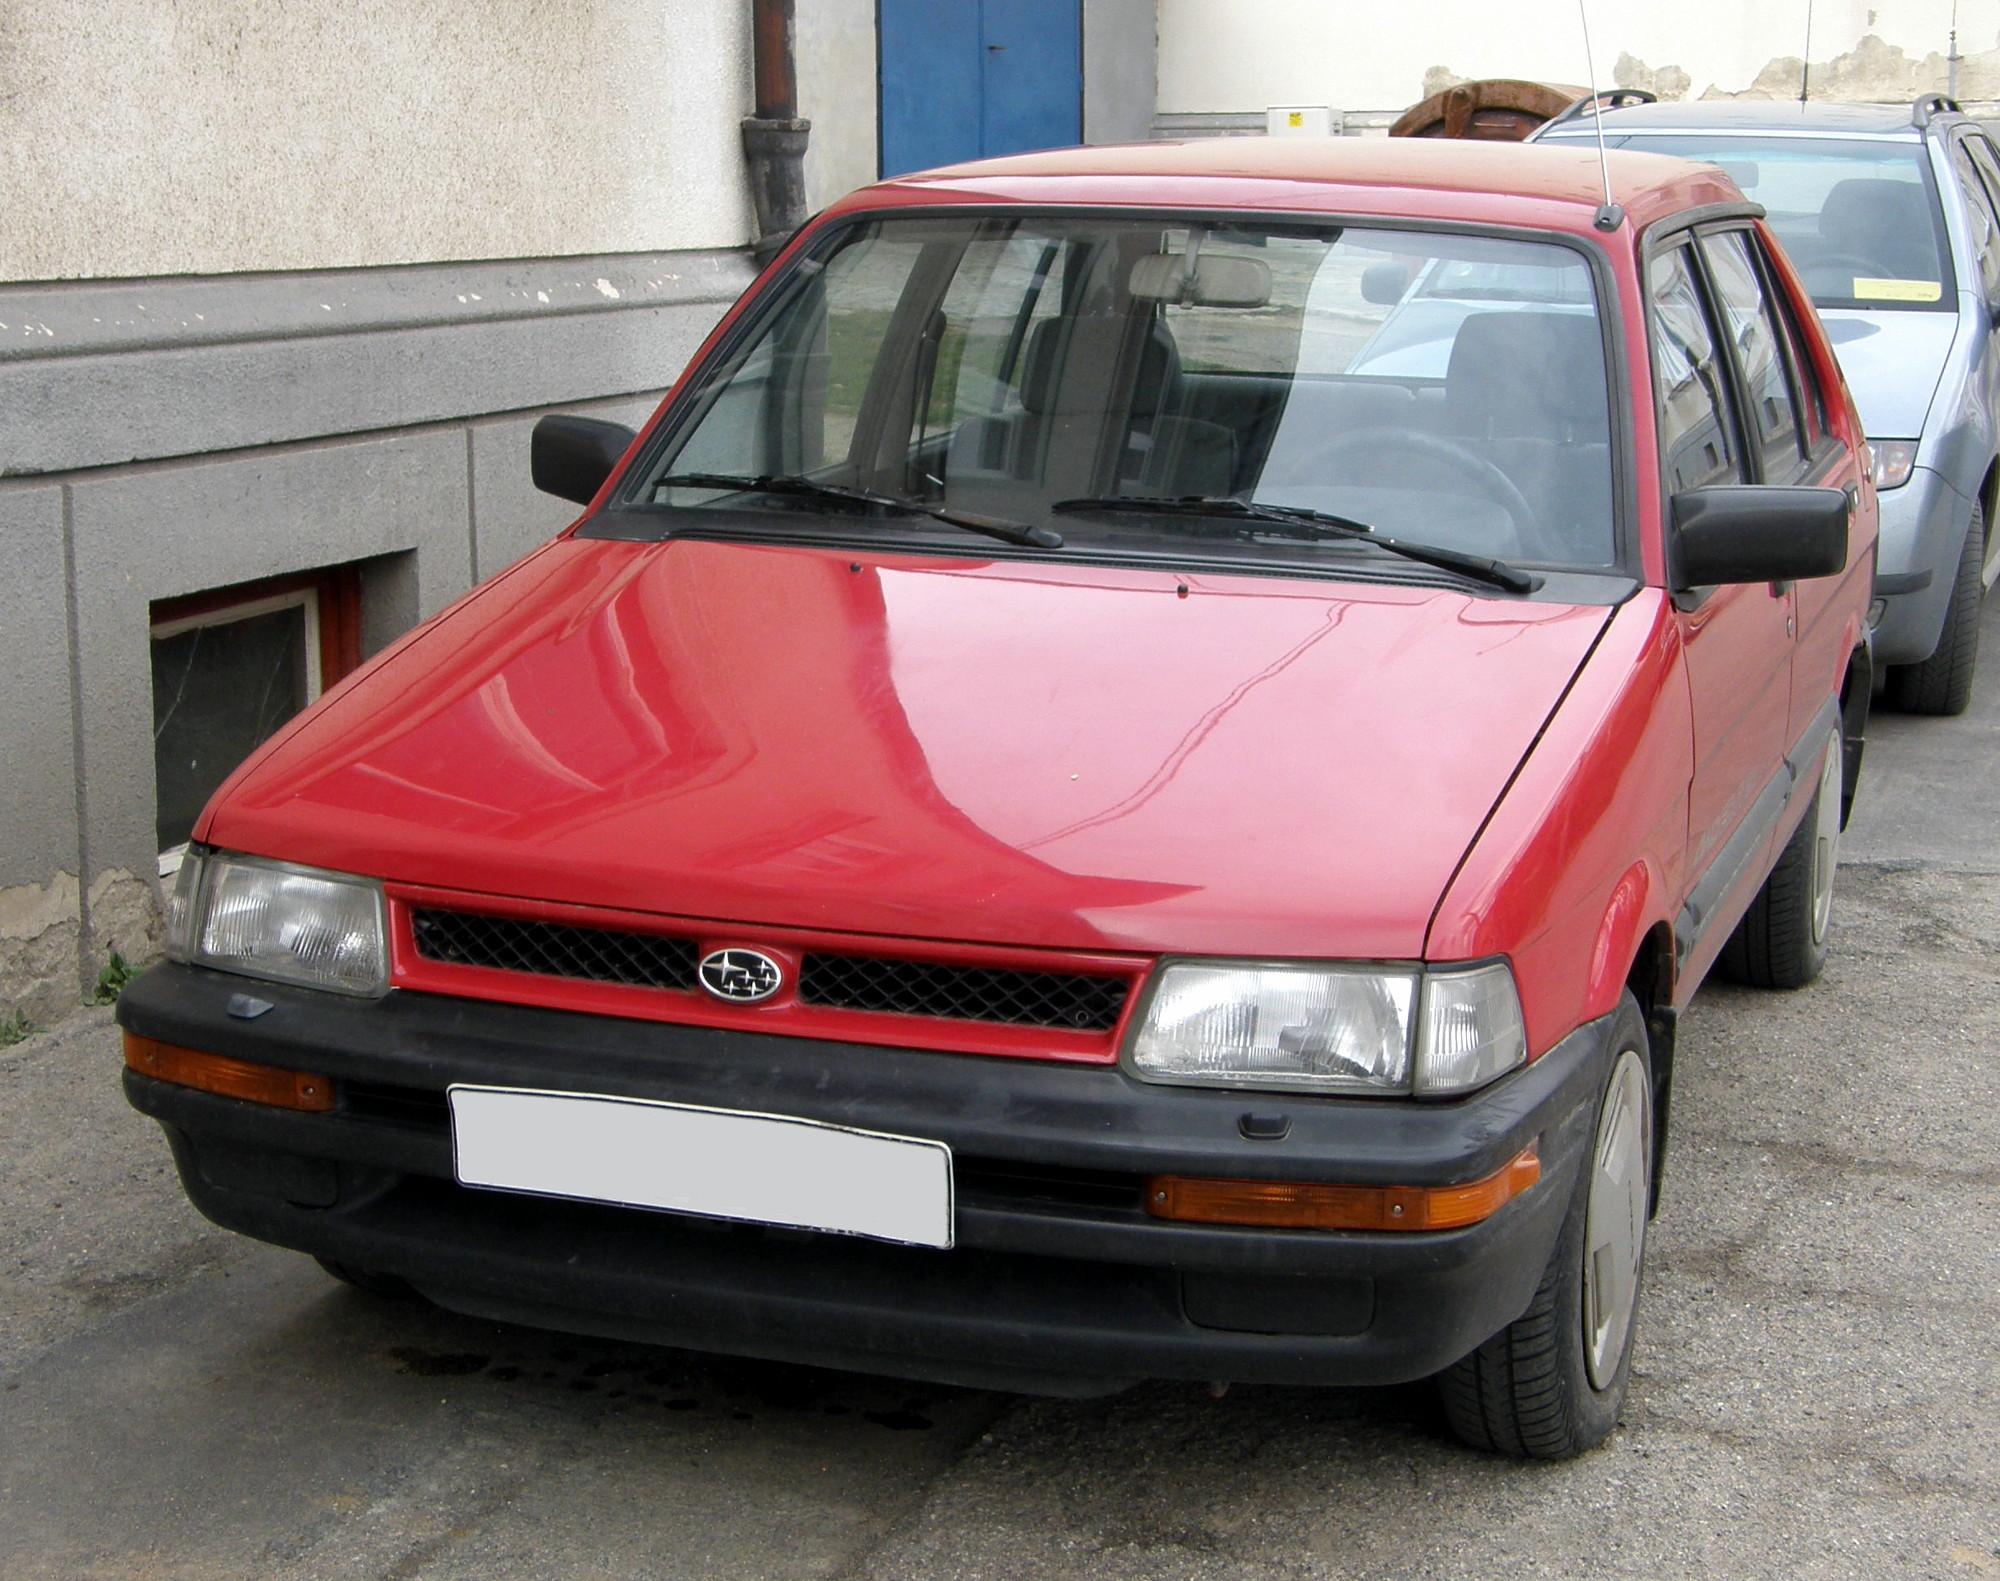 Subaru Justy I 1984 - 1987 Hatchback 3 door #3